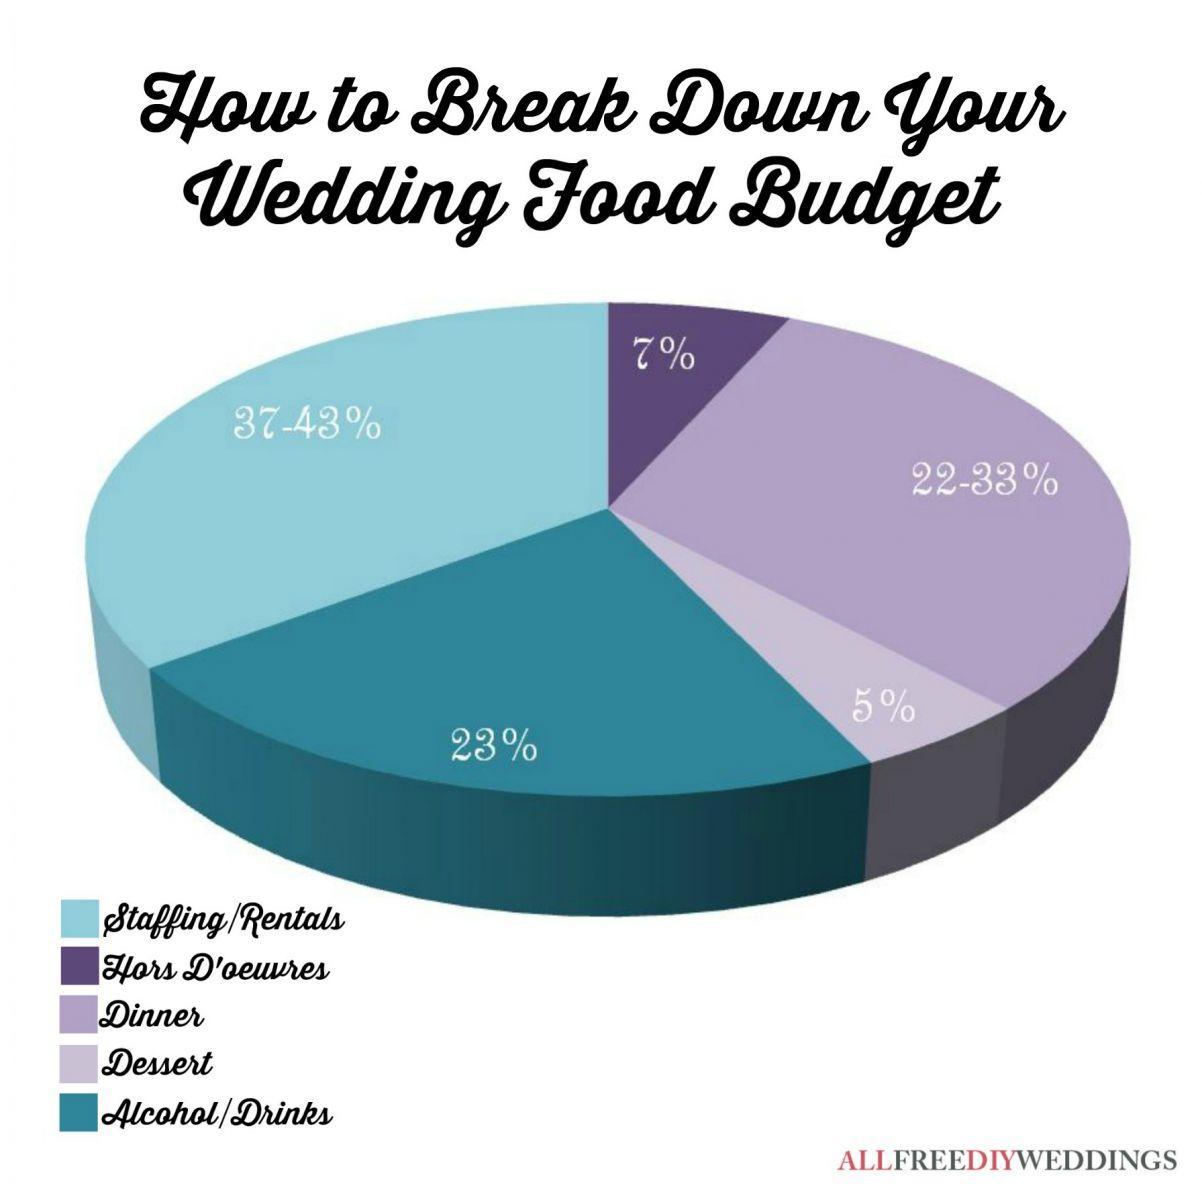 Wedding Budget Breakdown Food